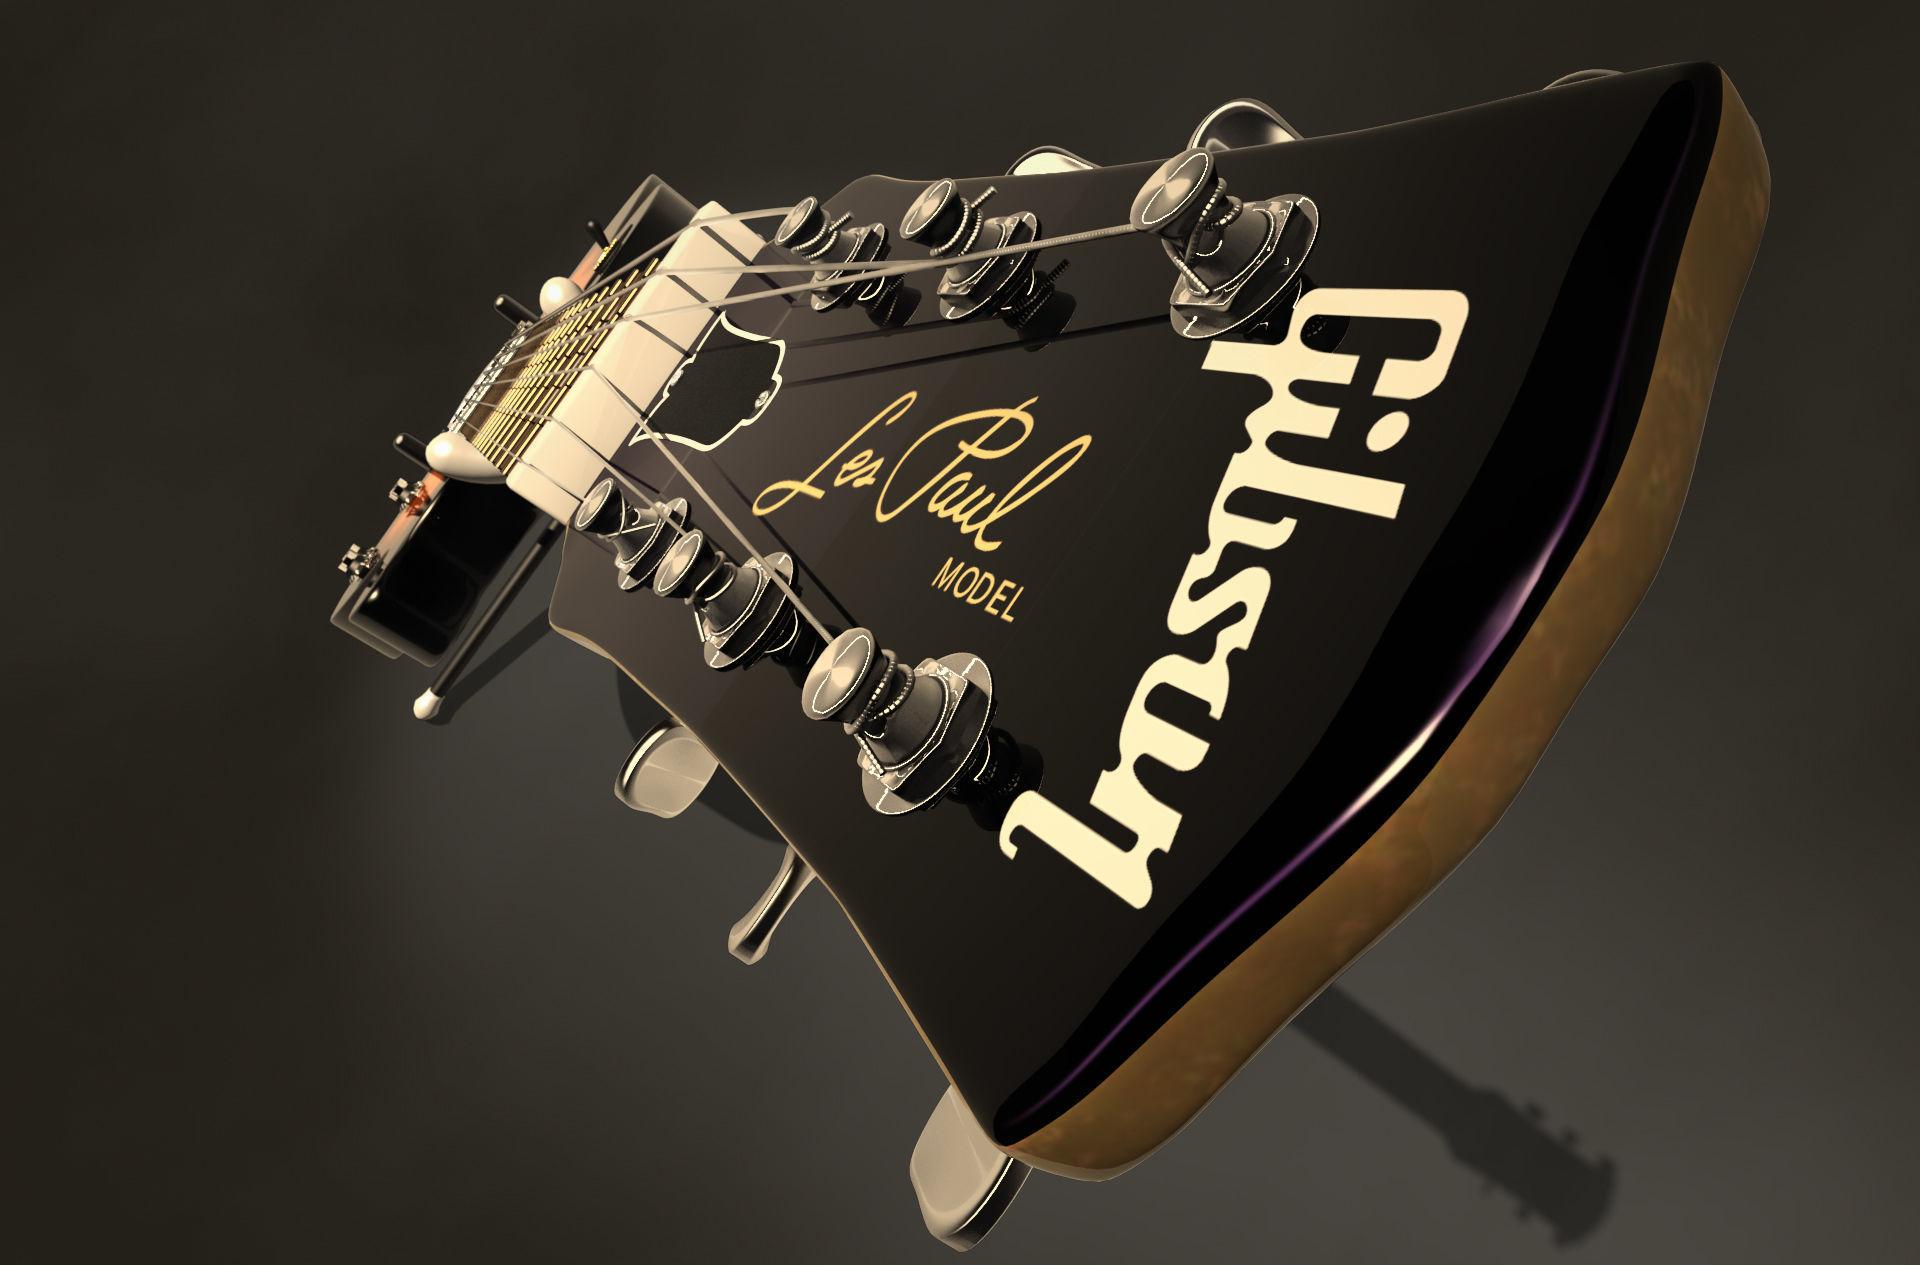 Electric guitar Gibson Les paul